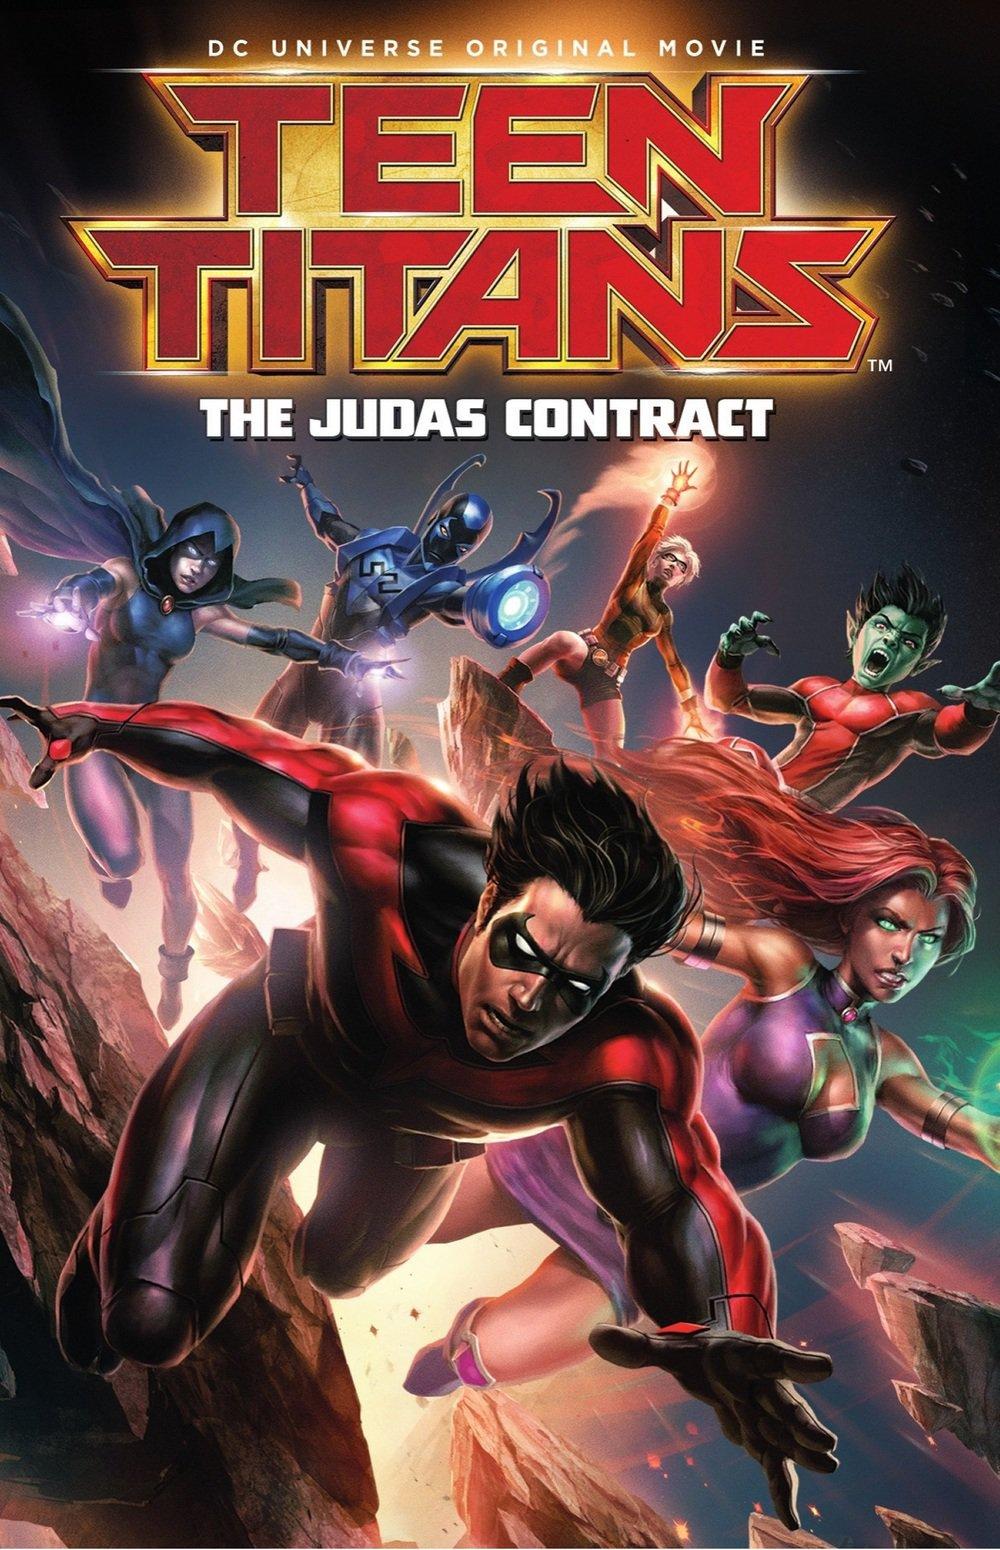 affiche du film Teen Titans: The Judas Contract